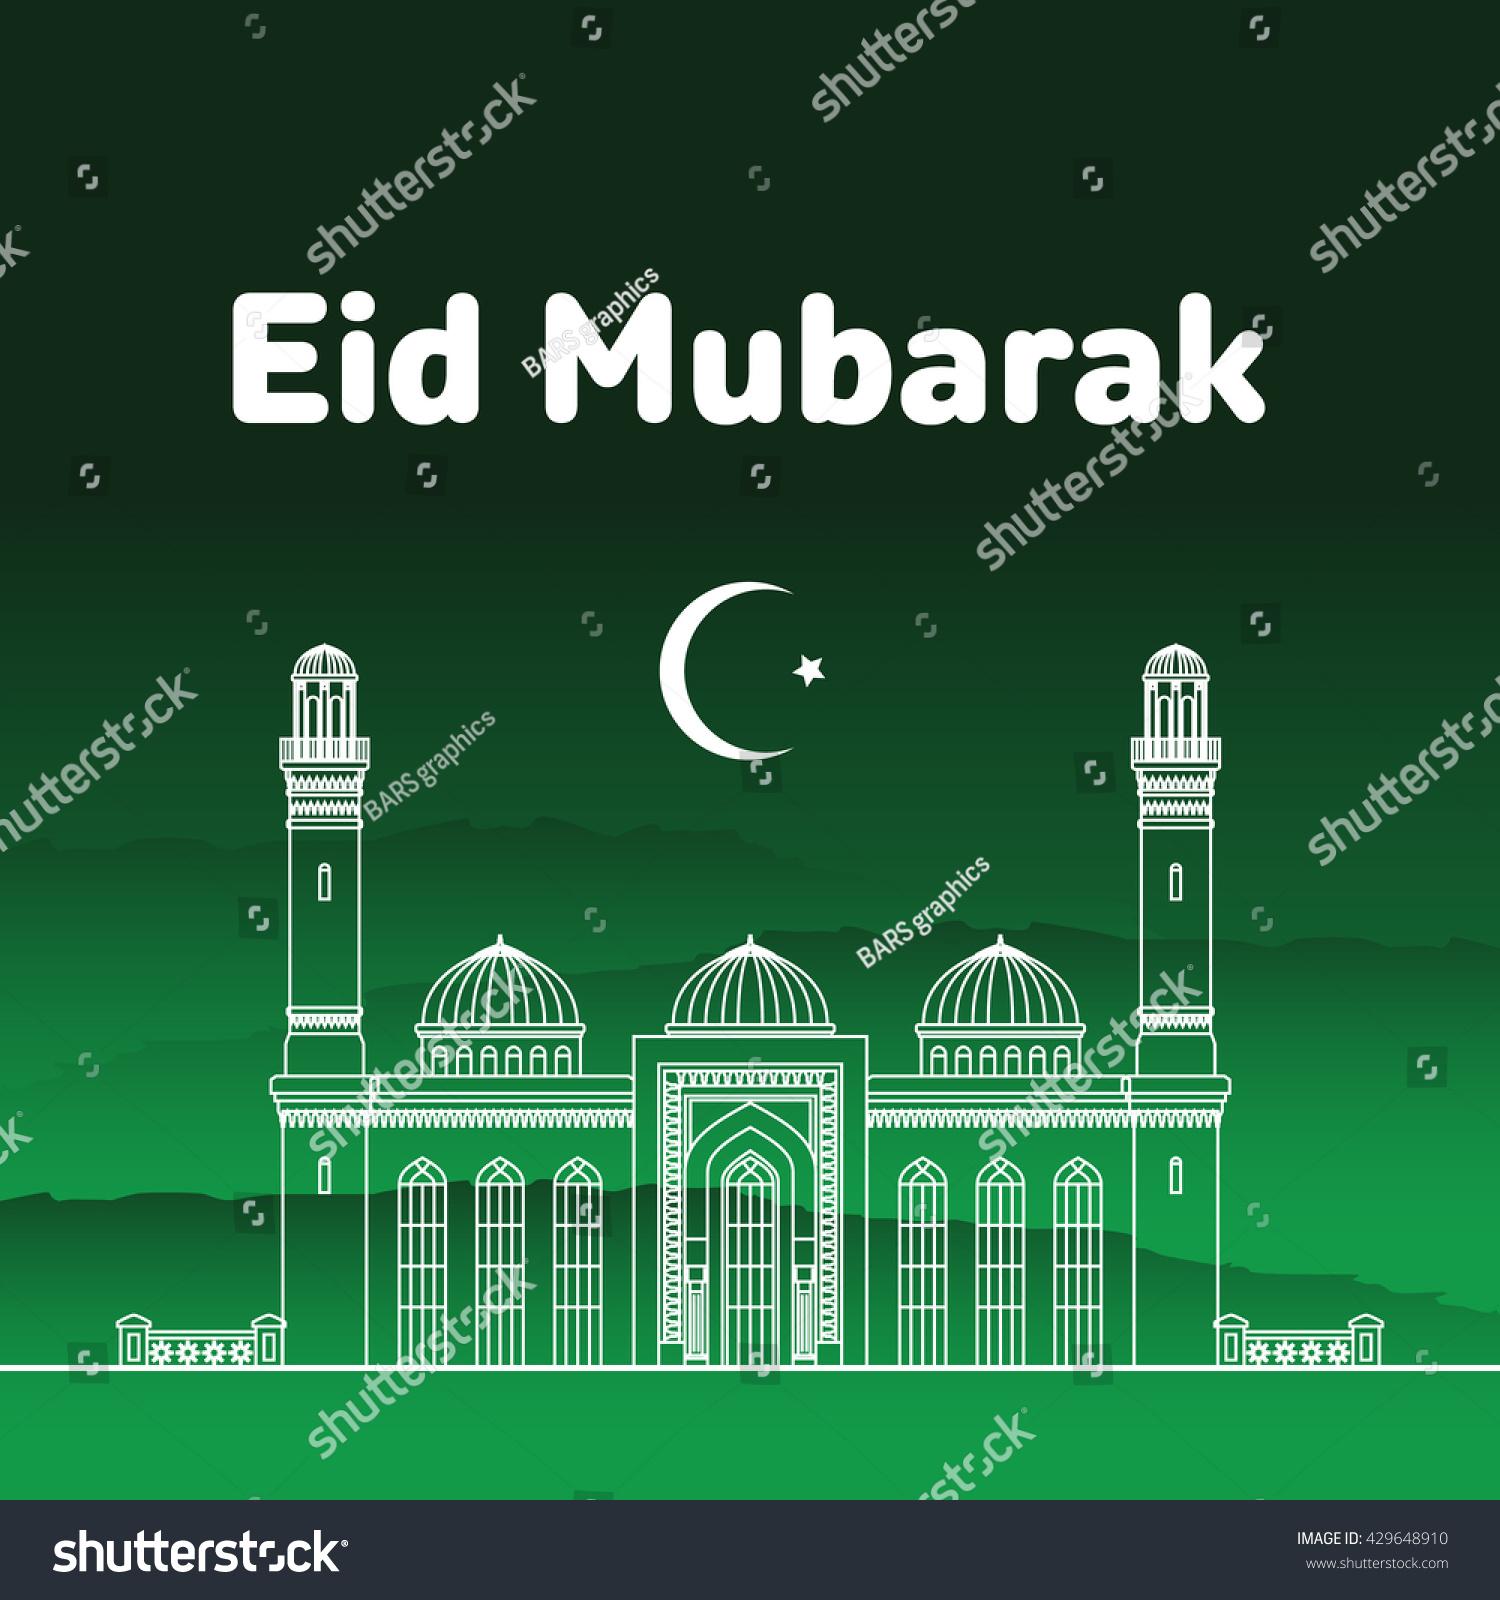 Eid Mubarak Ramadan Eid Al Adha Greeting Stock Vector Royalty Free